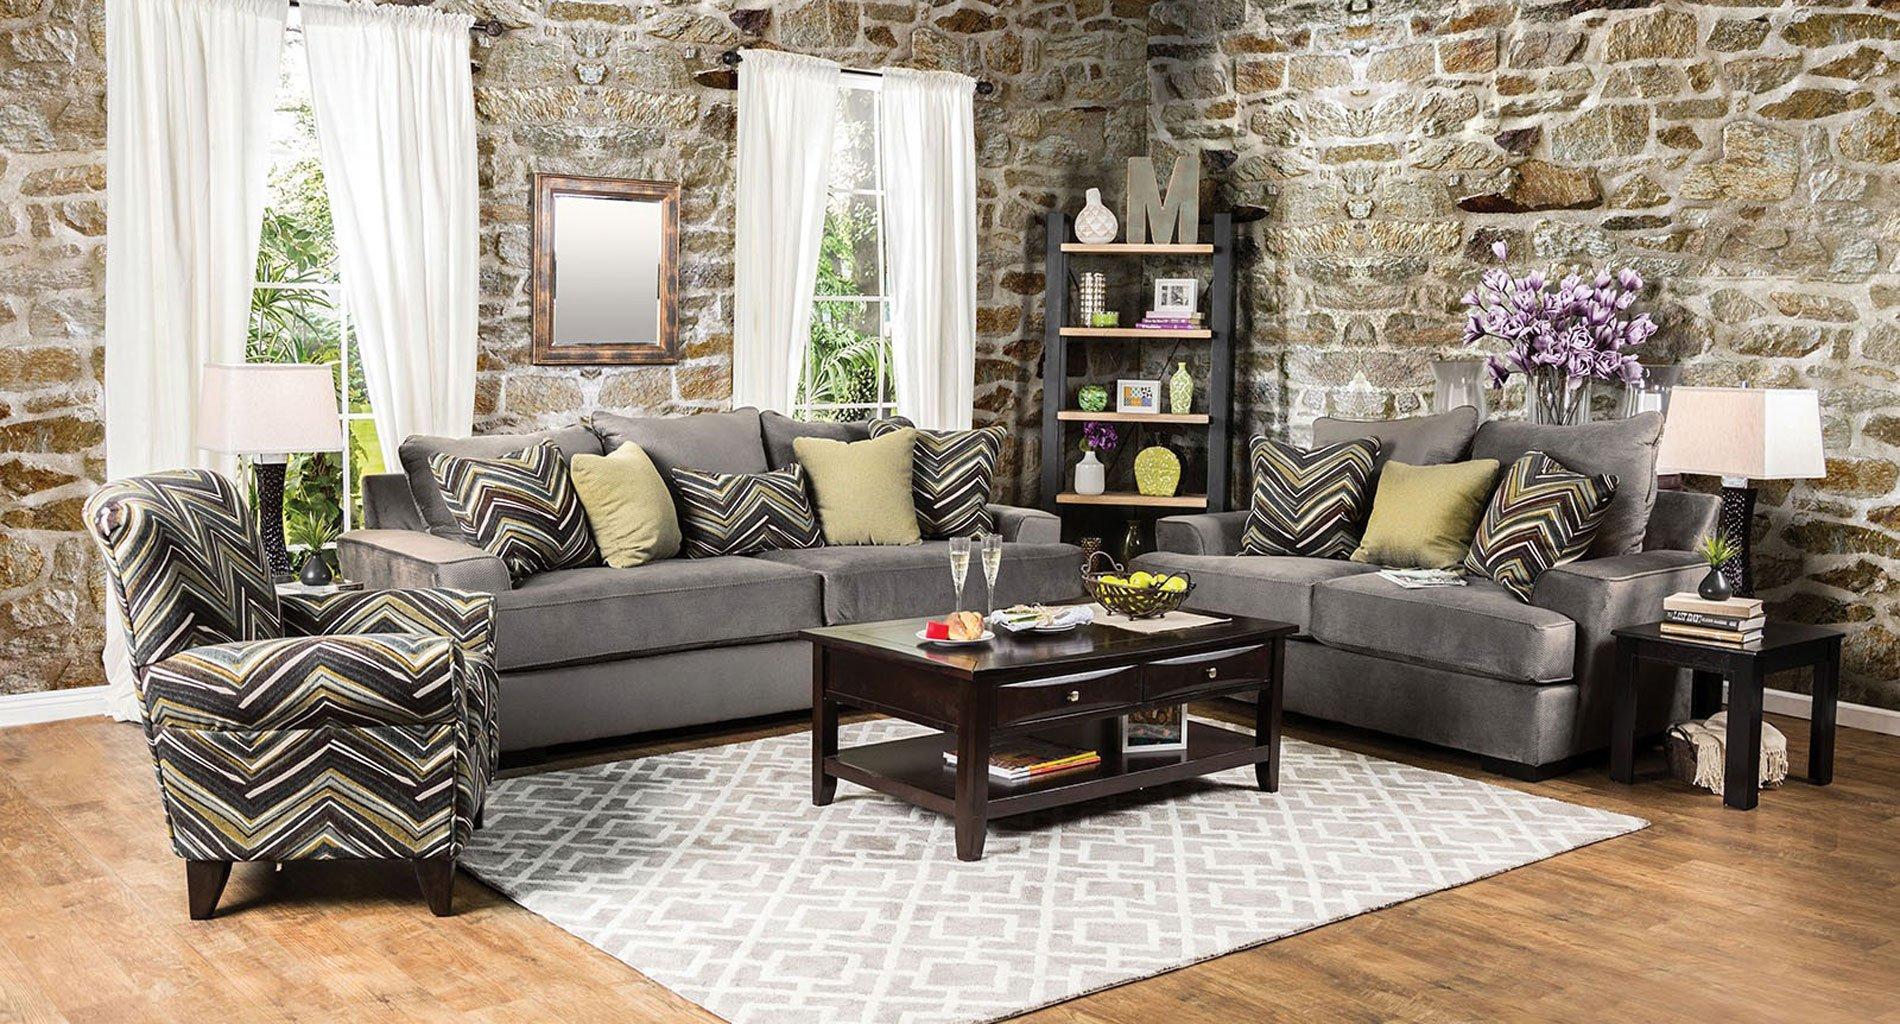 Cashel Living Room Set (Olive Gray) By Furniture Of